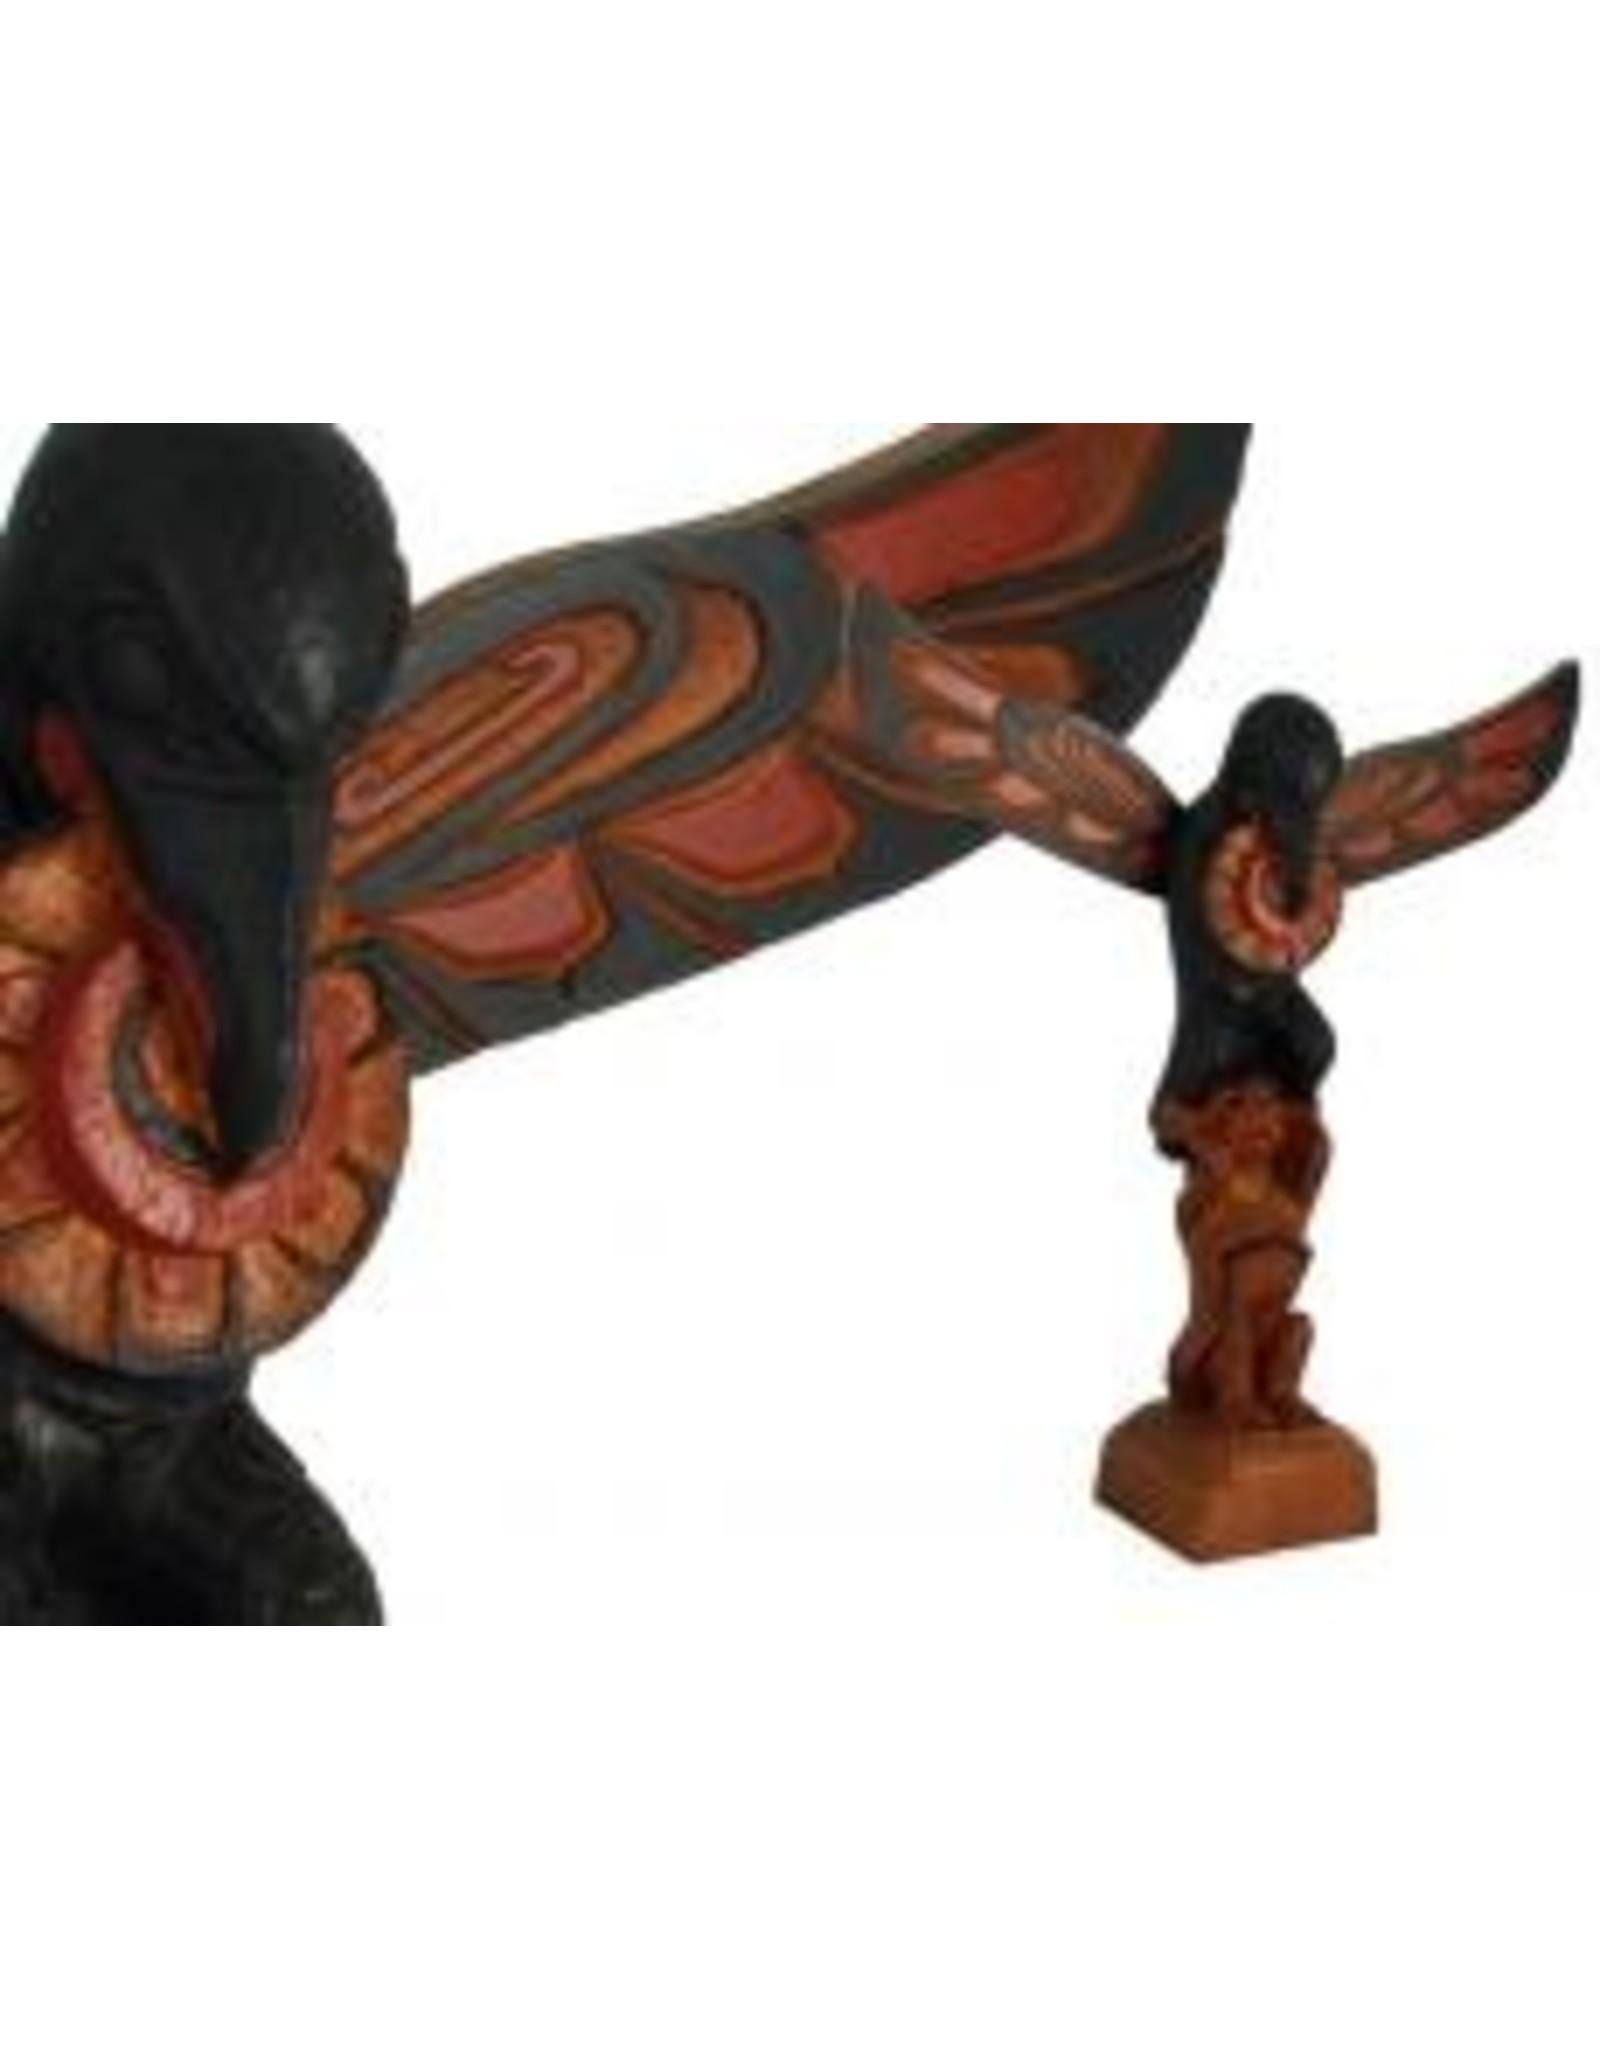 Raven Stealing Sun Totem Pole  - 401